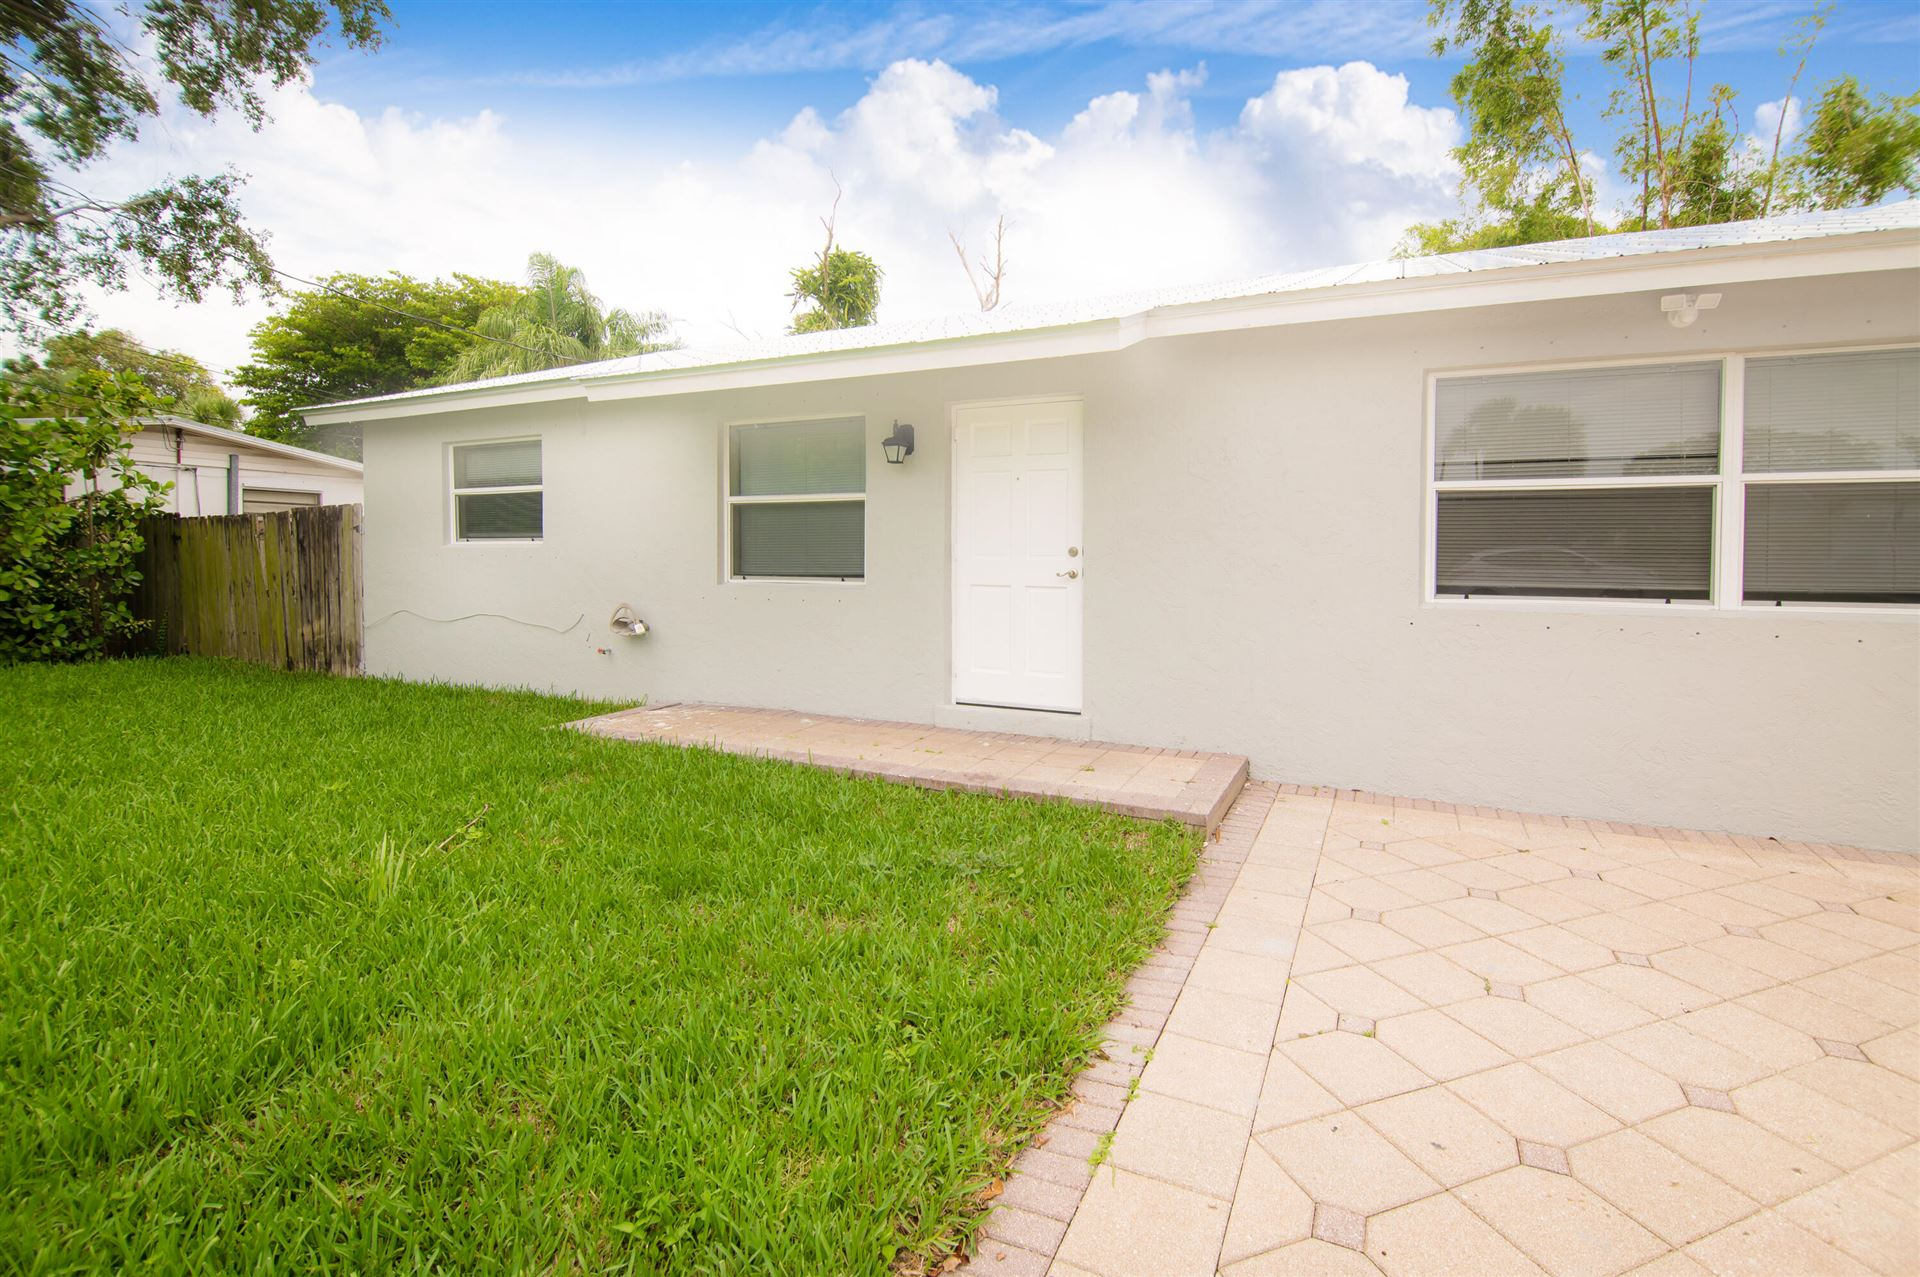 Photo of 1783 Wheeler Road, North Palm Beach, FL 33408 (MLS # RX-10725692)